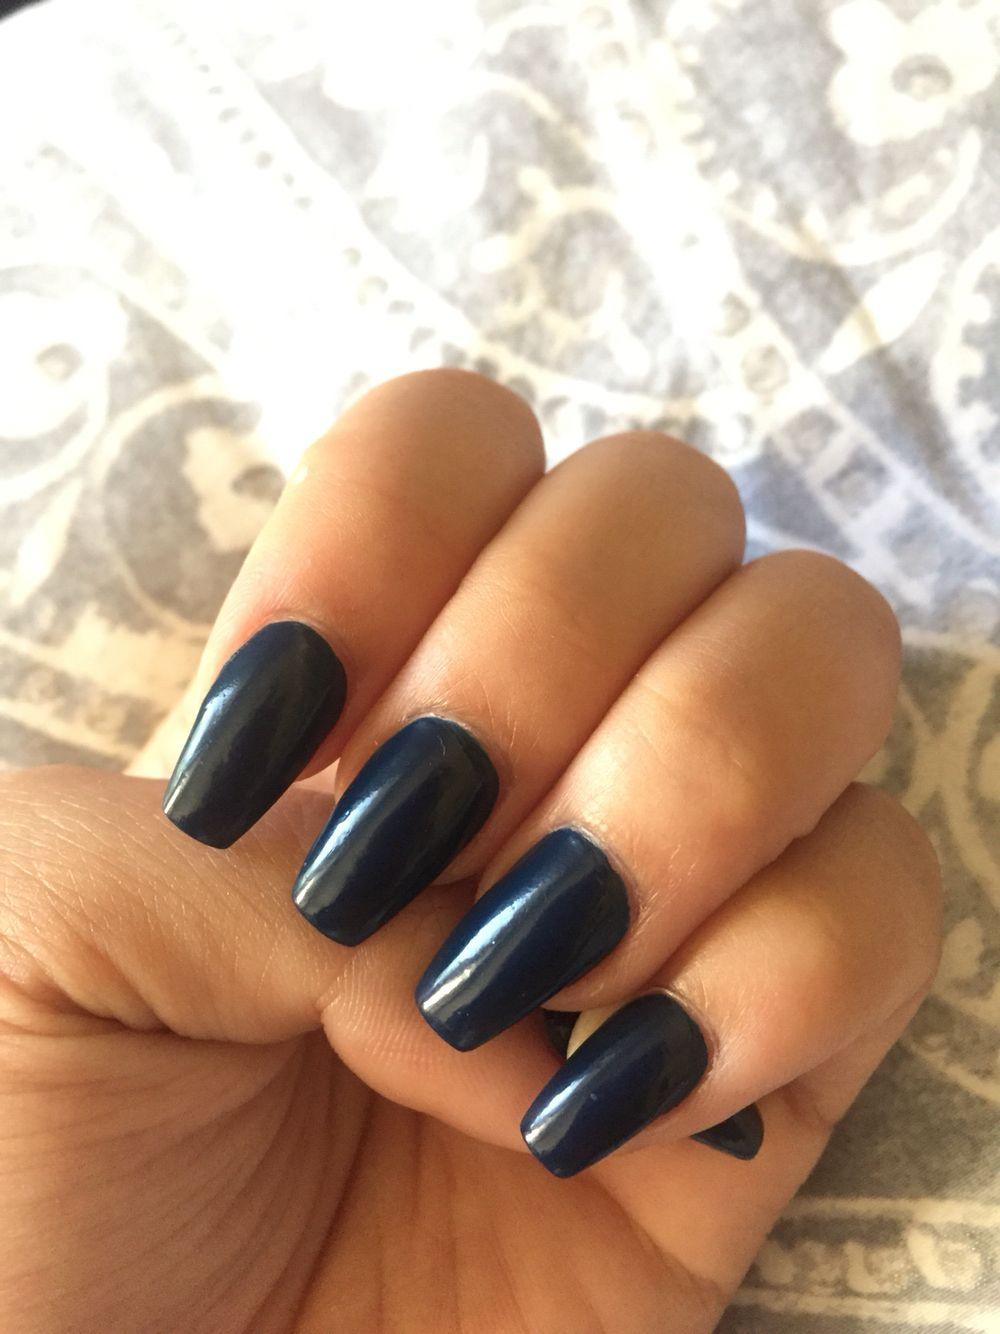 Acrylic coffin shaped cute dark blue black nails | Nails | Pinterest ...